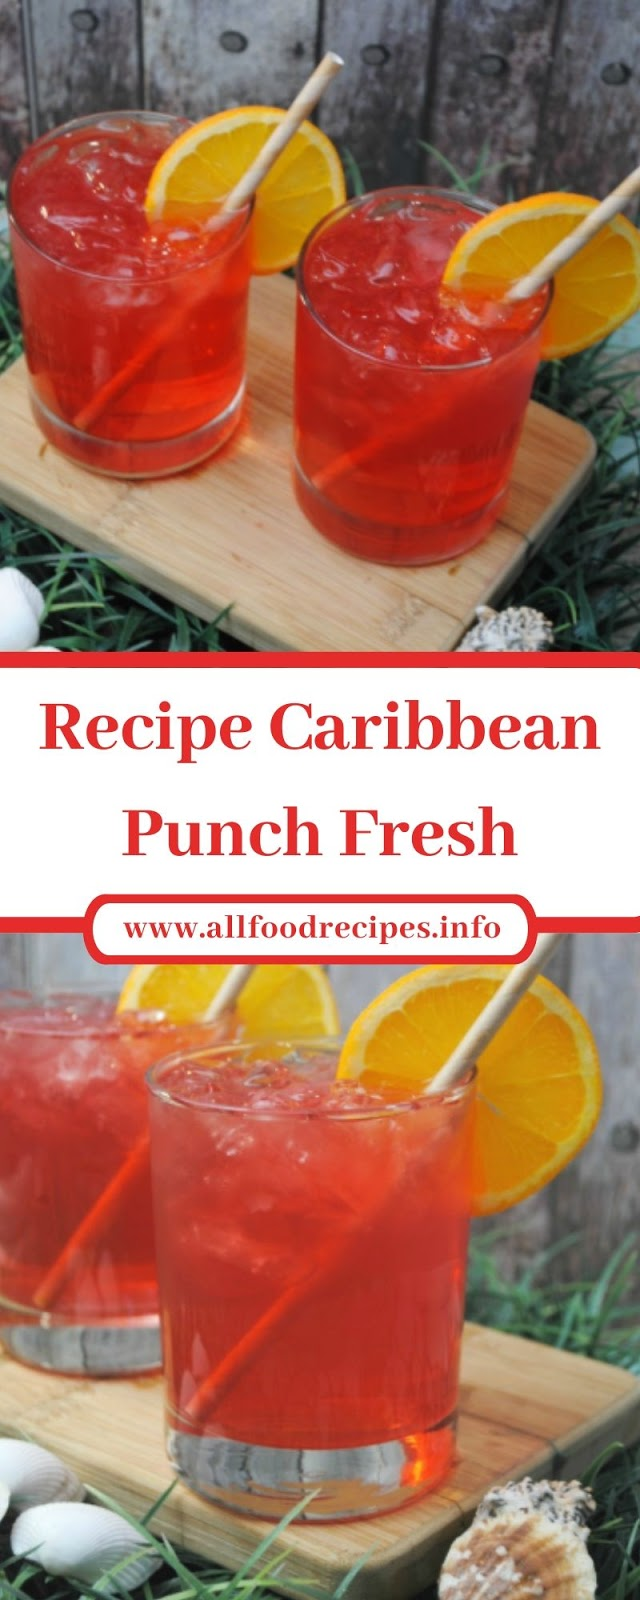 Recipe Caribbean Punch Fresh